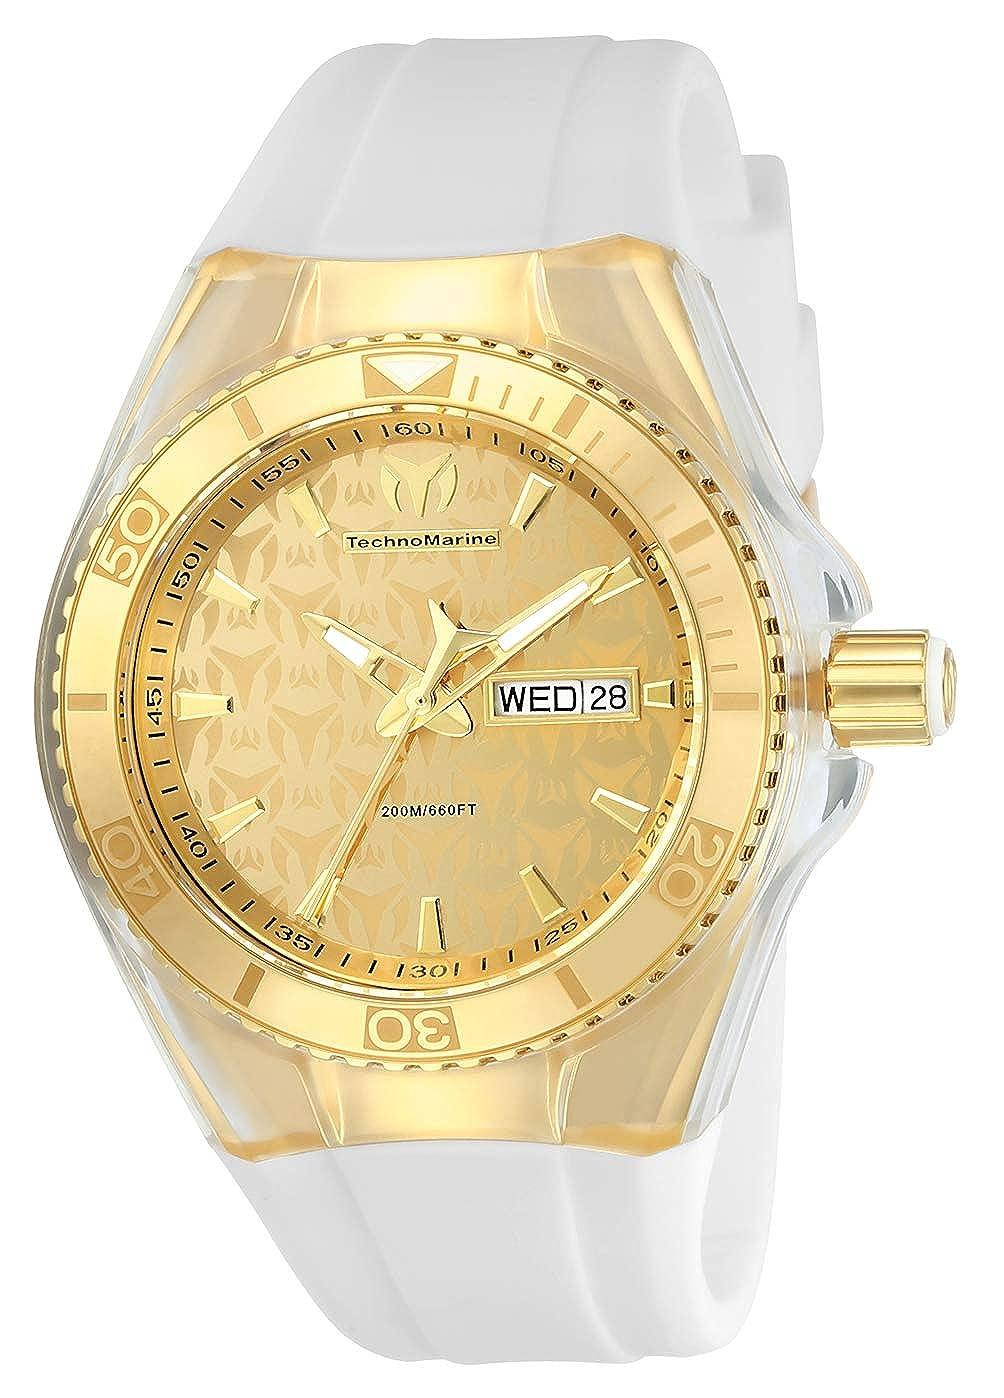 Technomarine Women s Cruise Monogram Stainless Steel Quartz Watch with Silicone Strap, White, 26 Model TM-115022